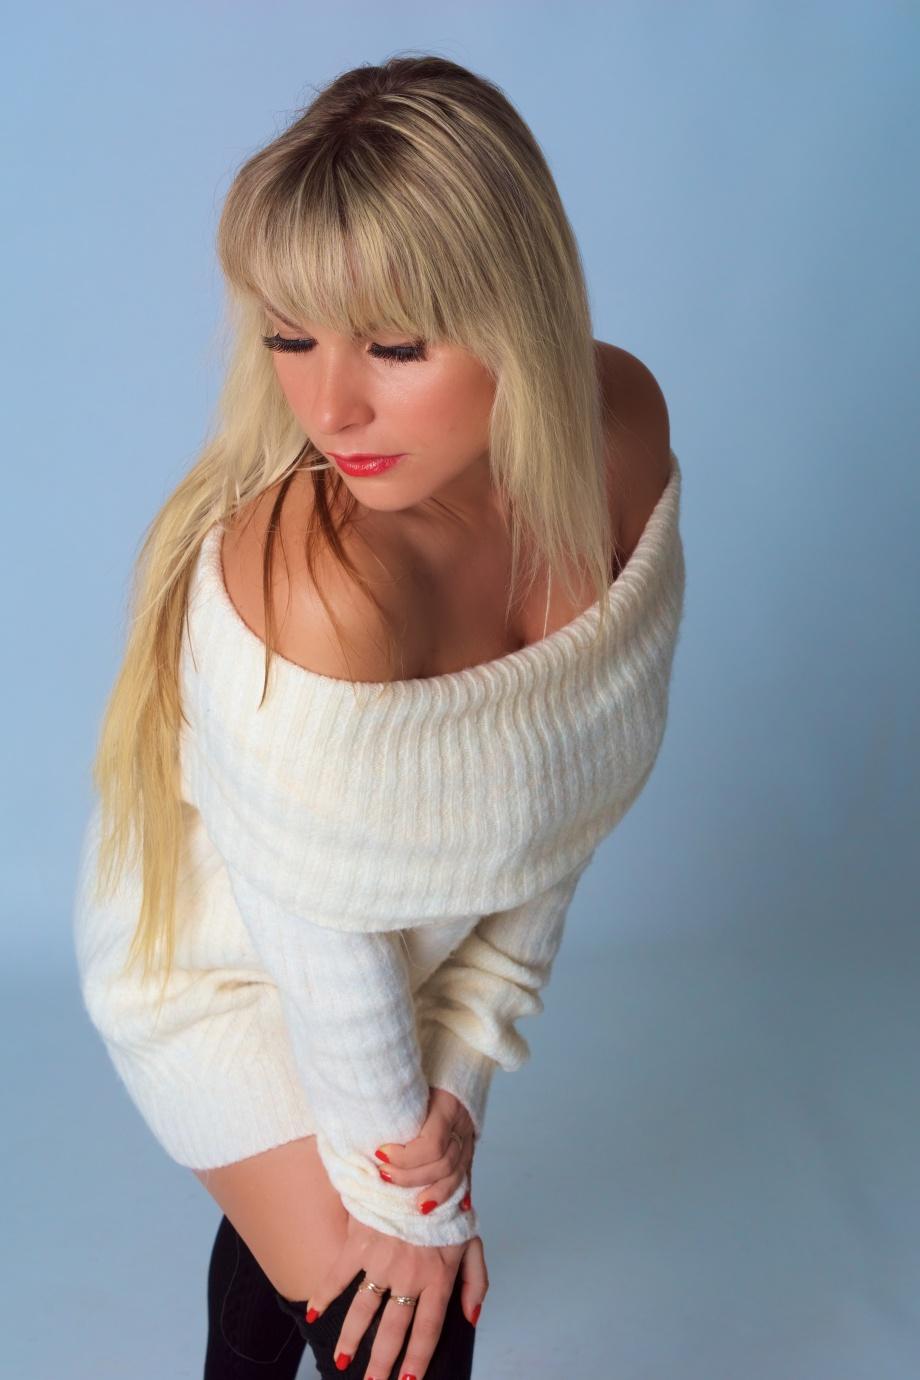 glamour, ireland, photoshoot, studio, blonde, cork, model